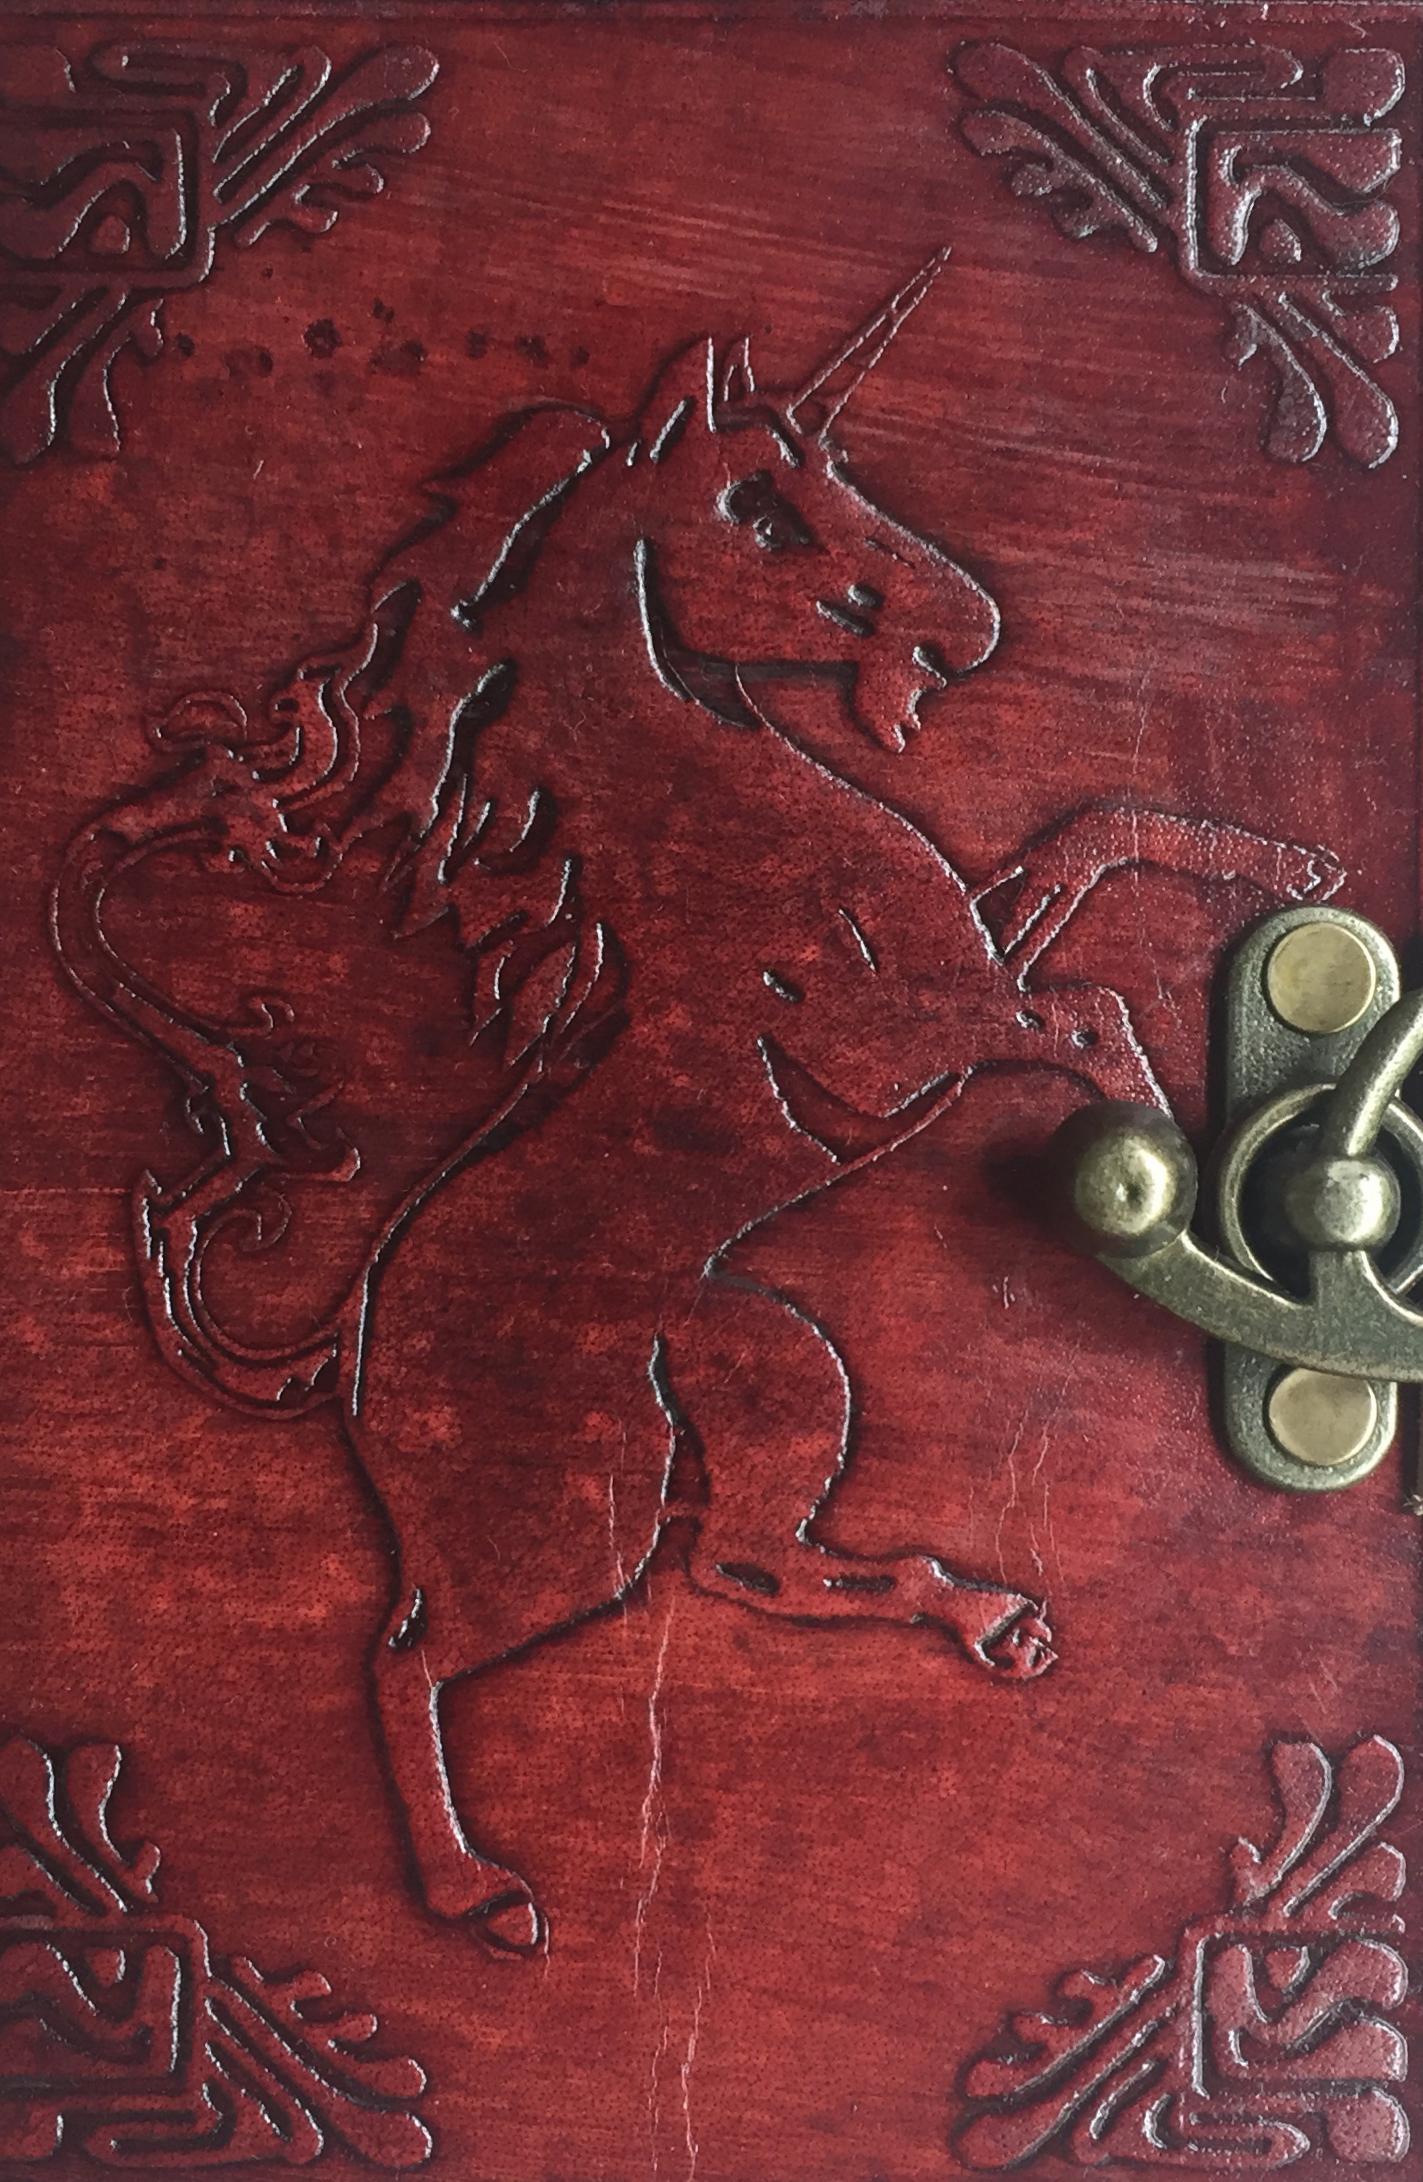 Unicorn_detail.jpg